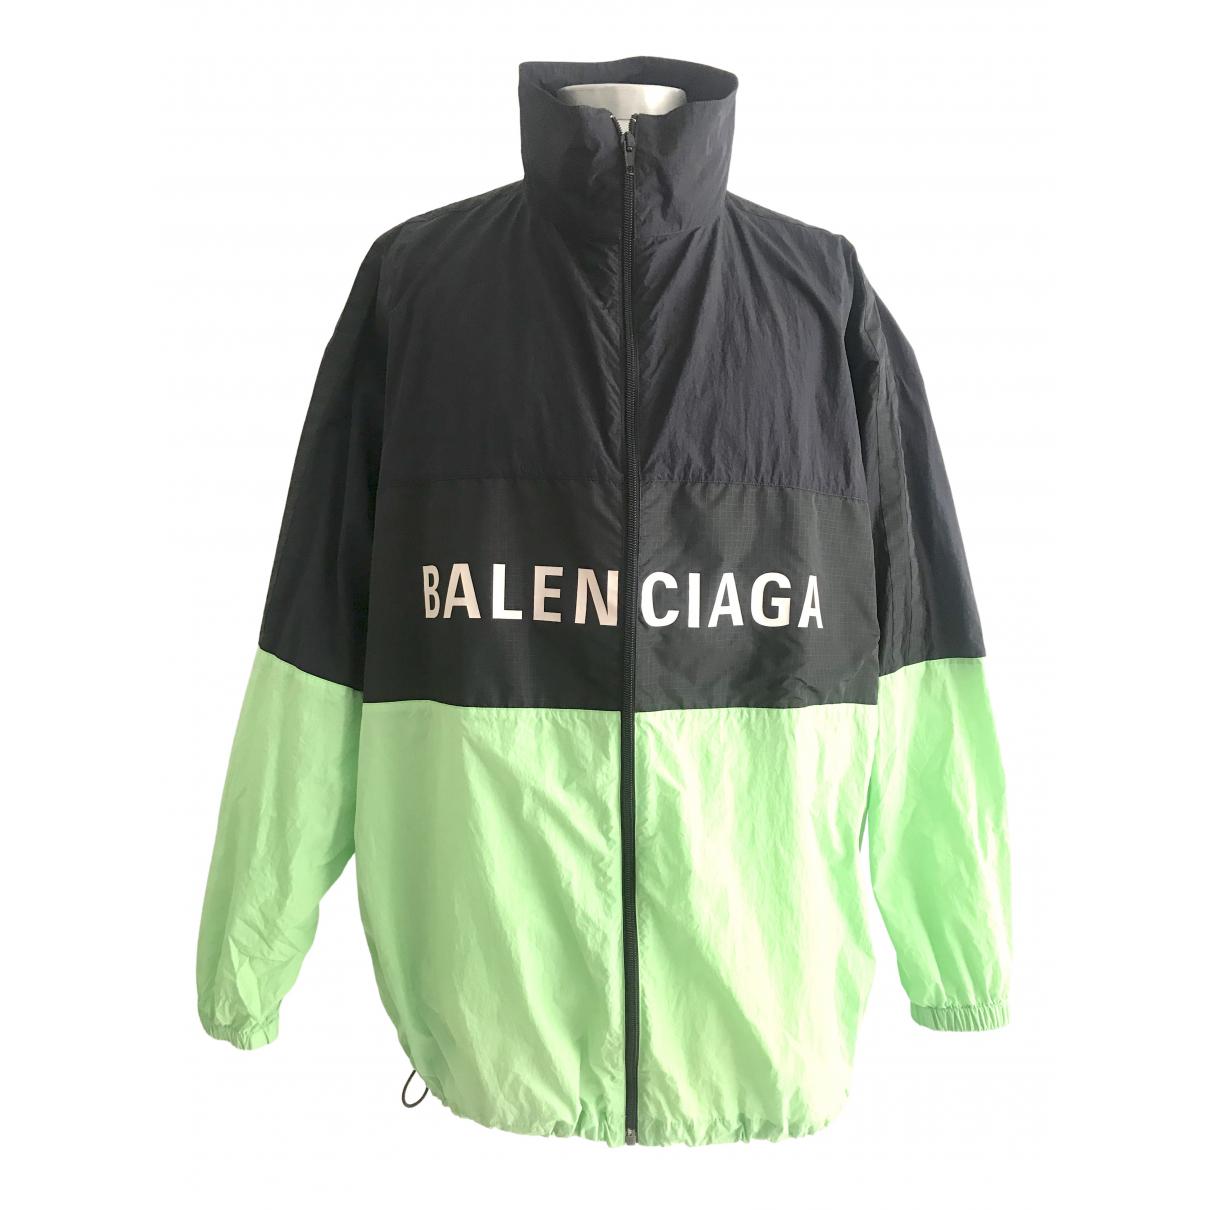 Balenciaga - Veste   pour femme - multicolore